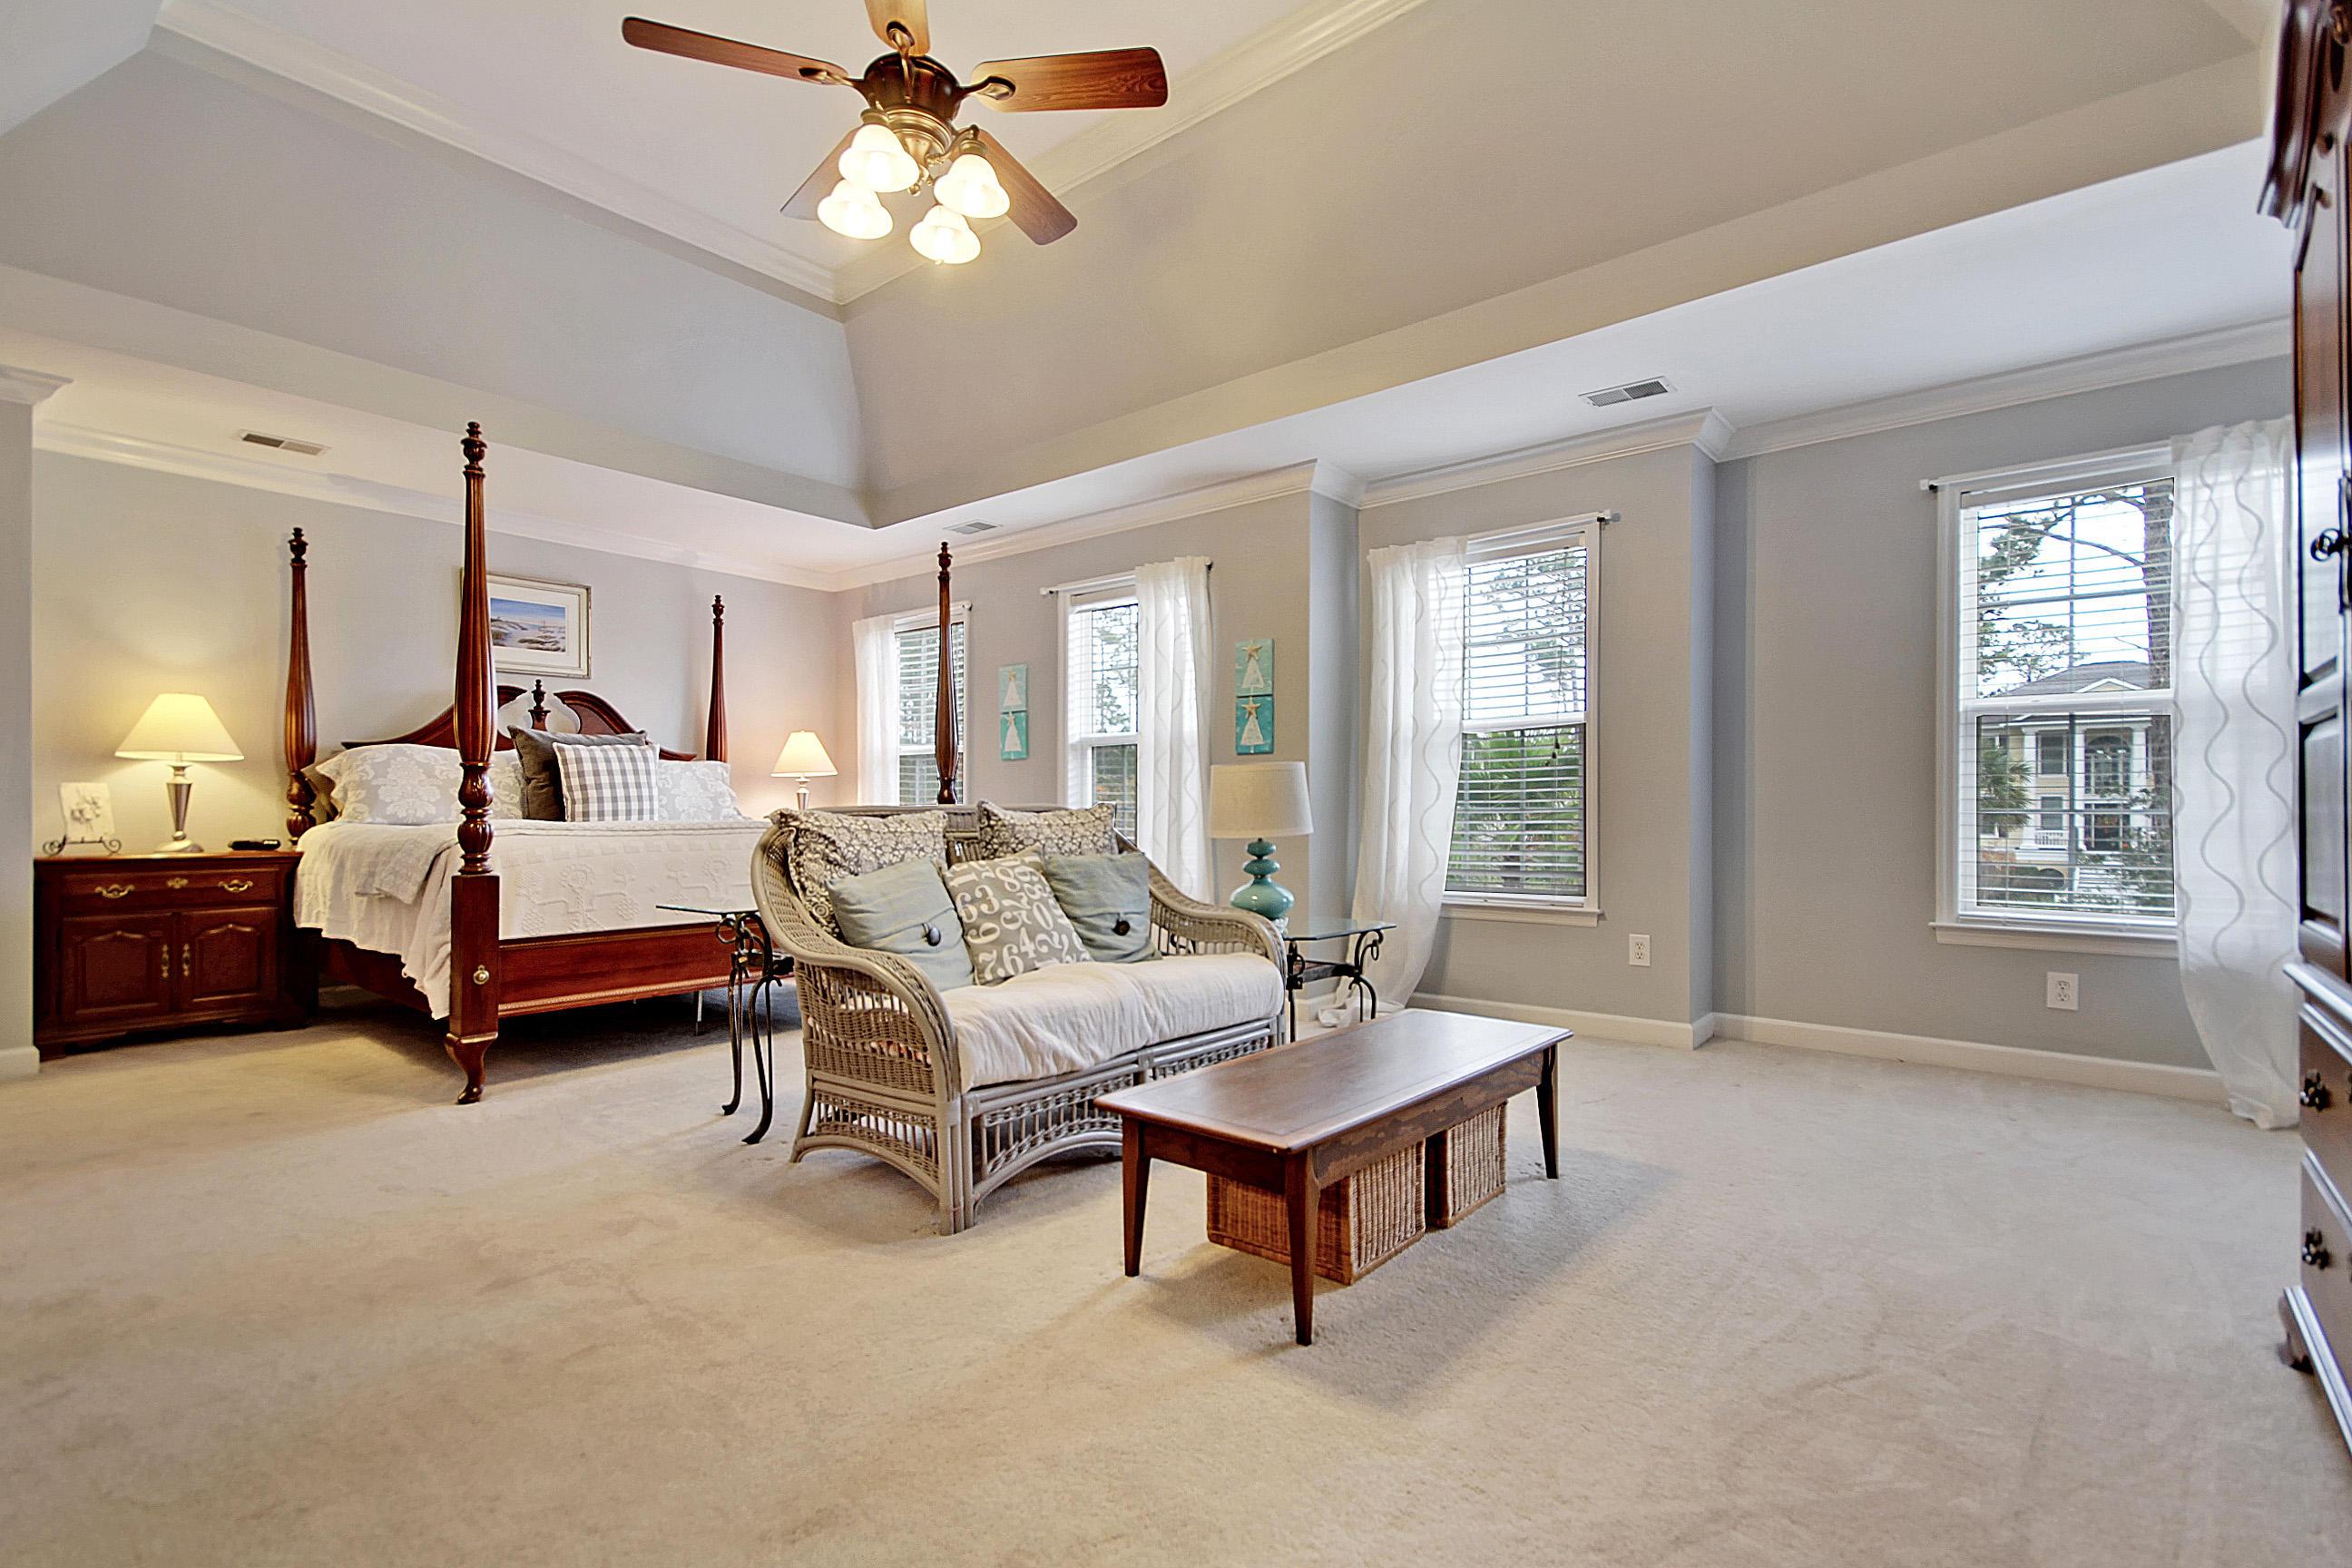 Dunes West Homes For Sale - 2449 Darts Cove, Mount Pleasant, SC - 37